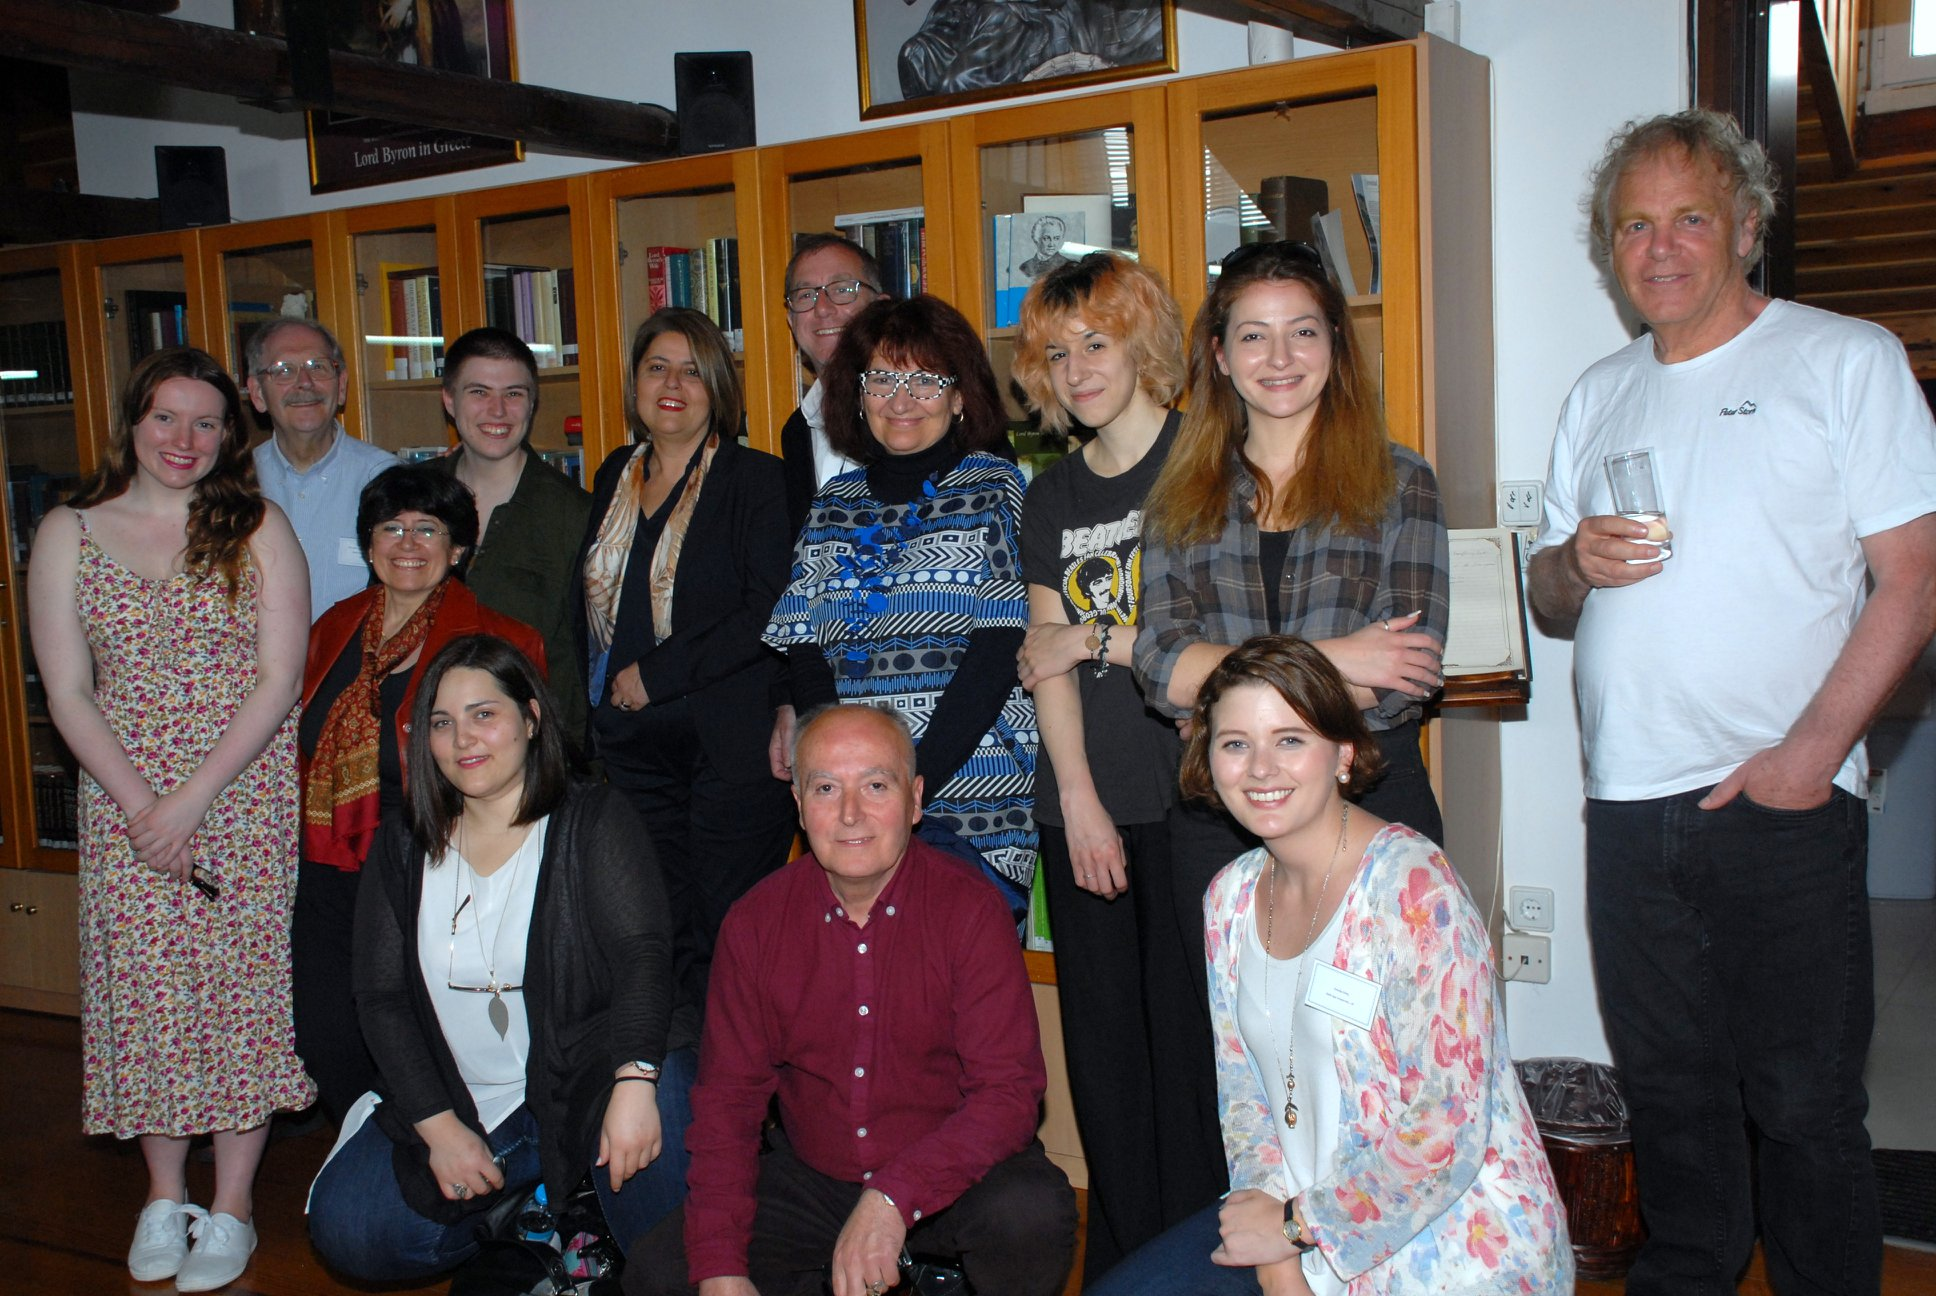 14o Διεθνές Φοιτητικό Βυρωνικό Συνέδριο, Υποδοχή Συνέδρων στην Βυρωνική Εταιρεία